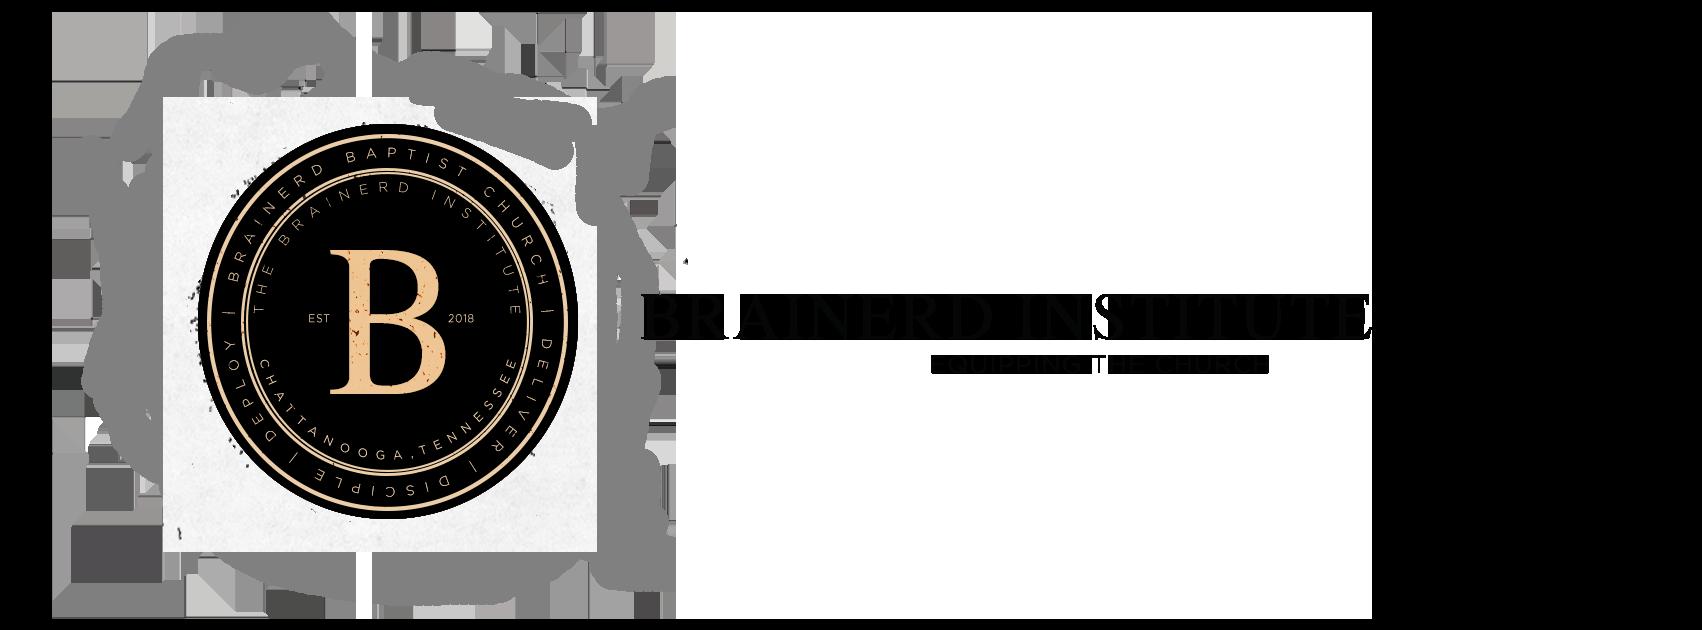 Brainerd institute header